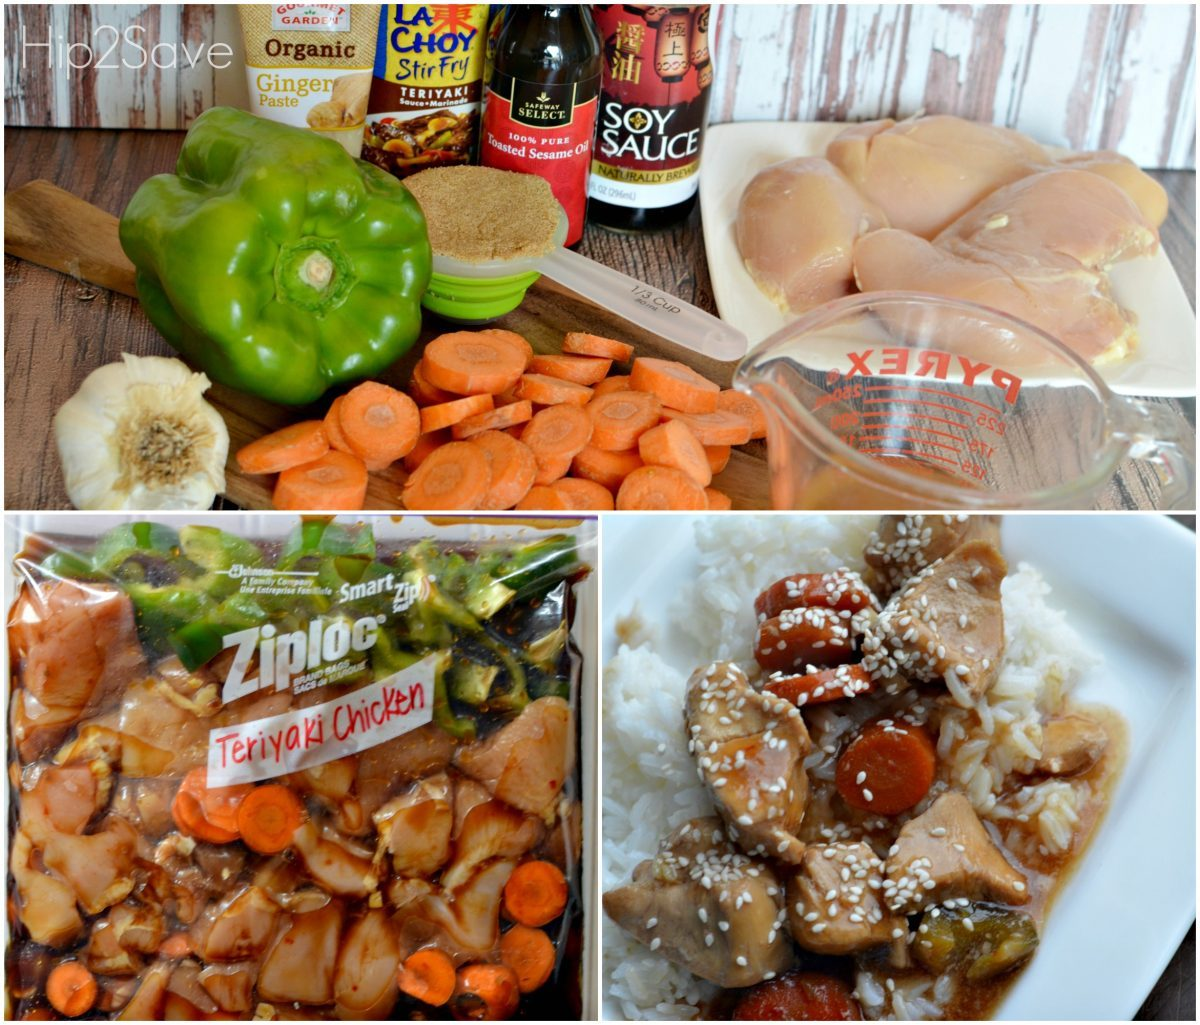 Teriyaki Chicken Freezer Bag Meal Hip2Save.com